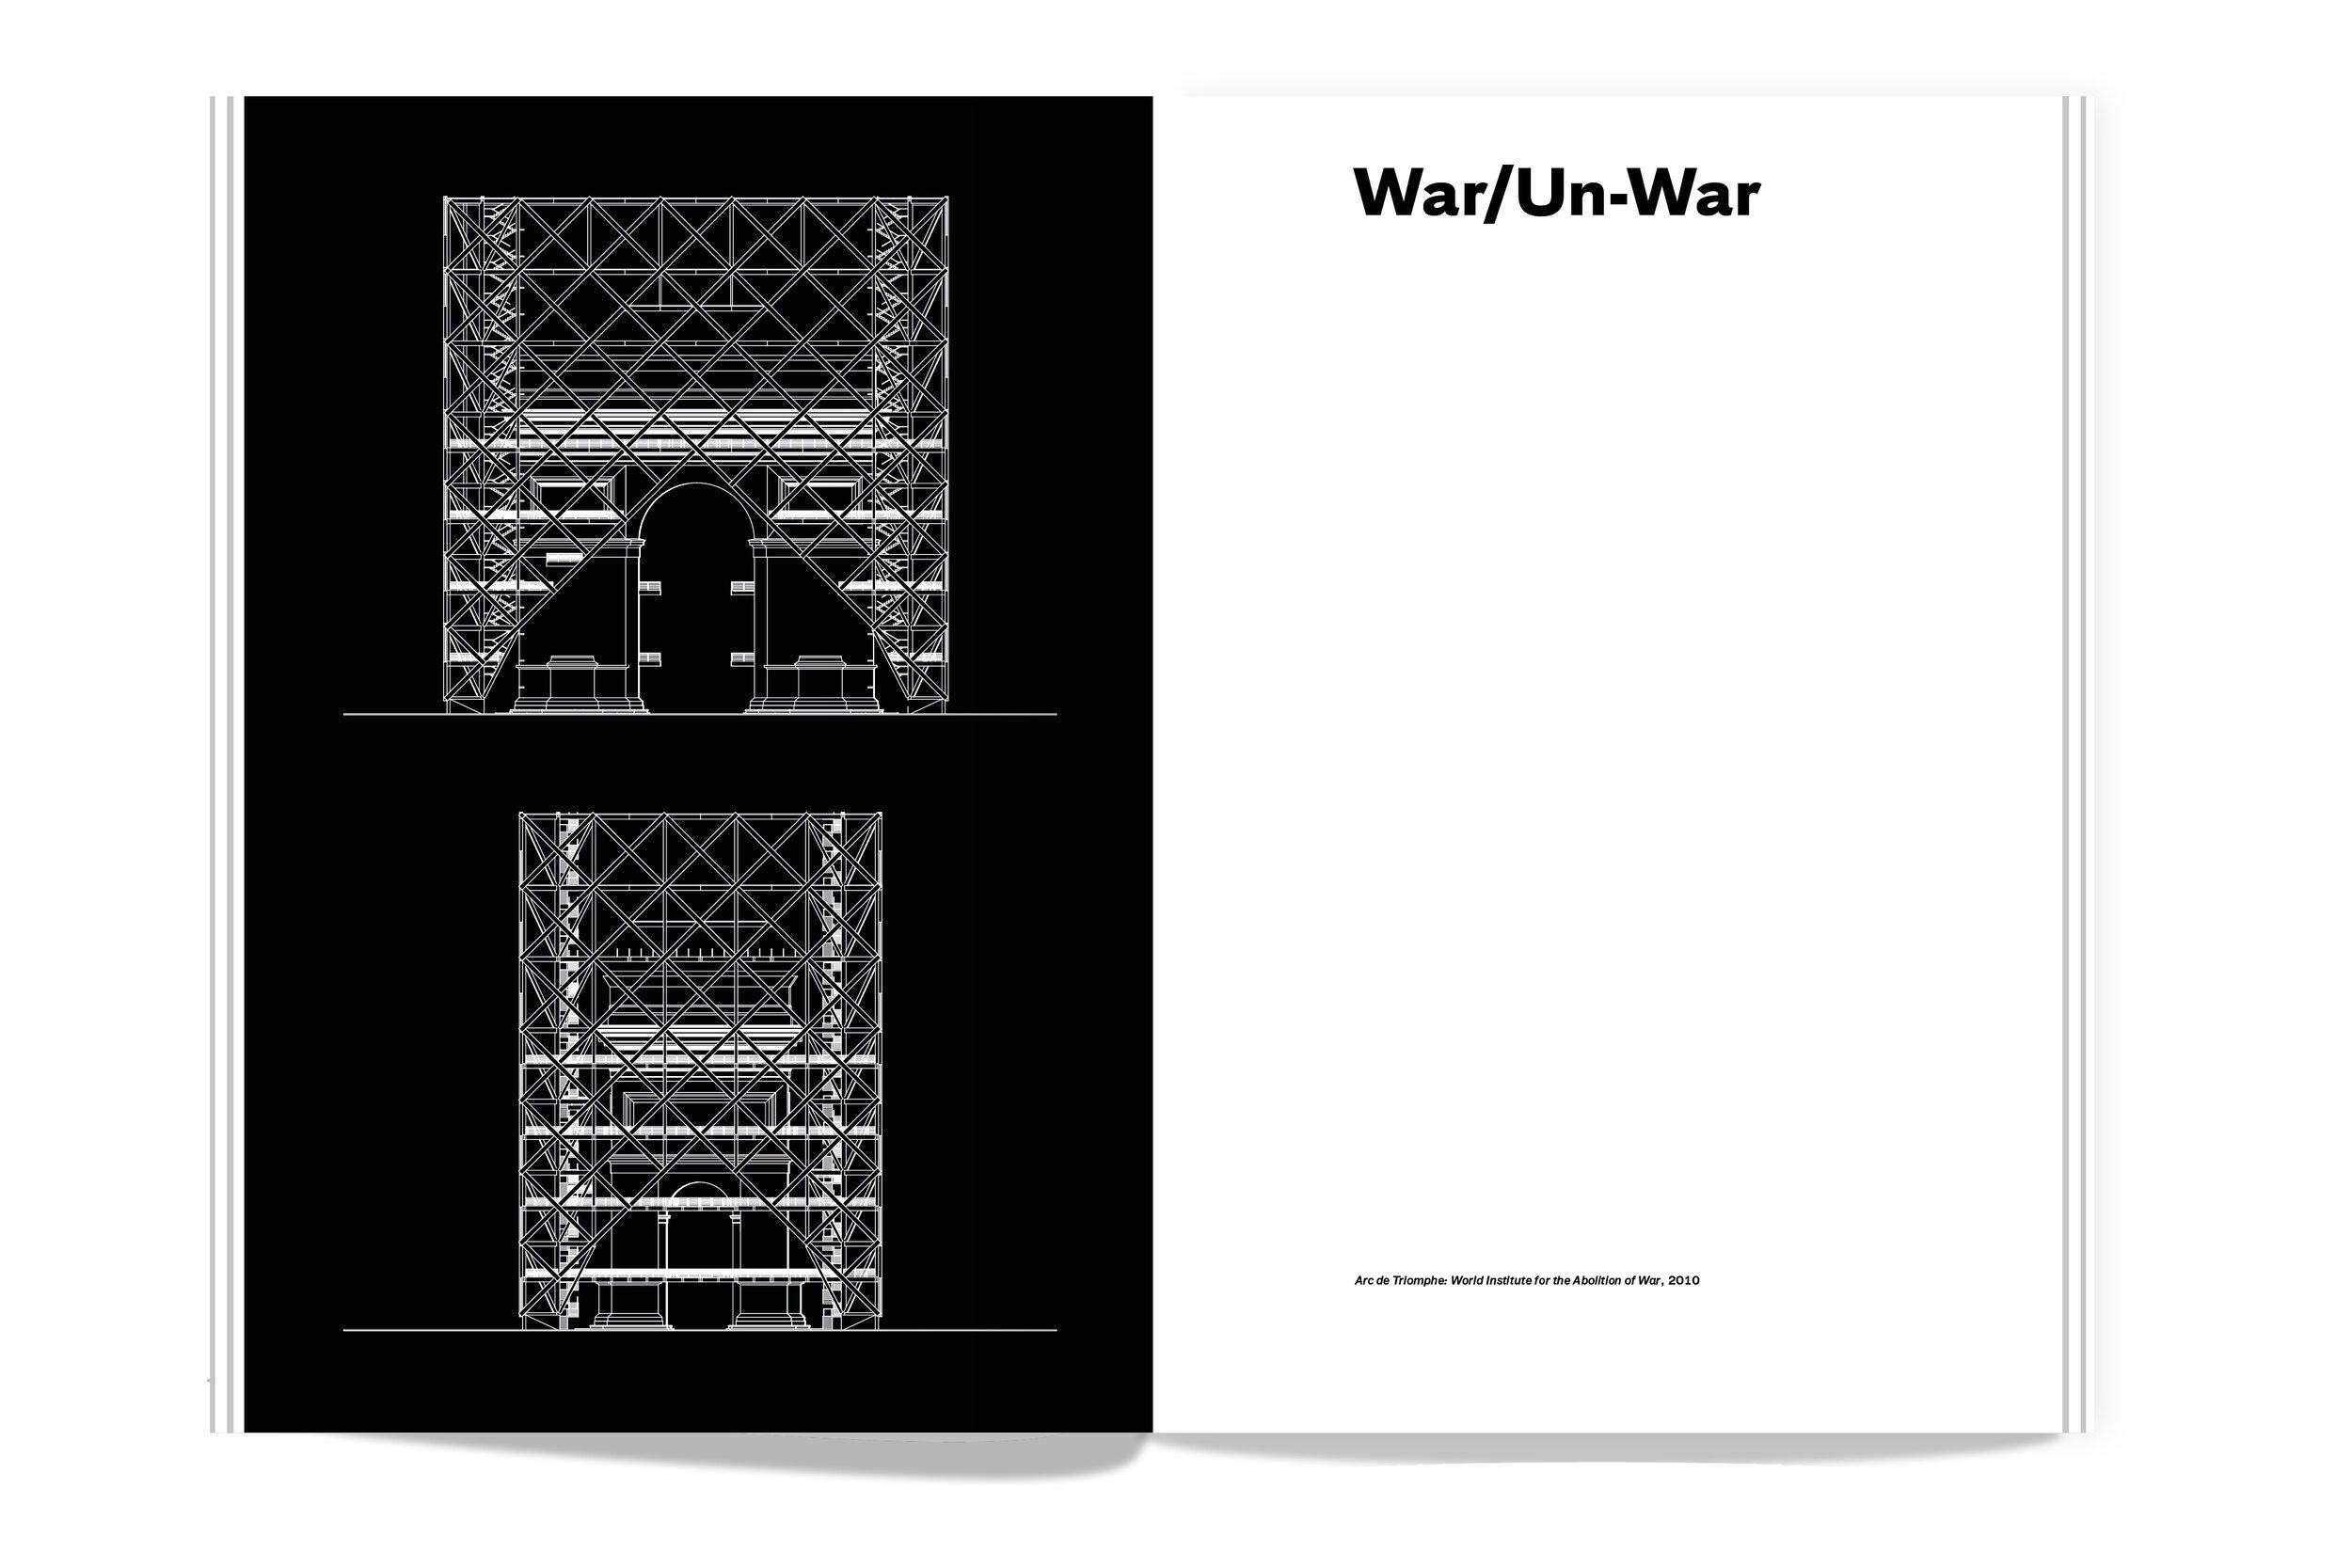 BDP_Transformative Avant-Garde & Other Writings_Inners_V2-003.jpg